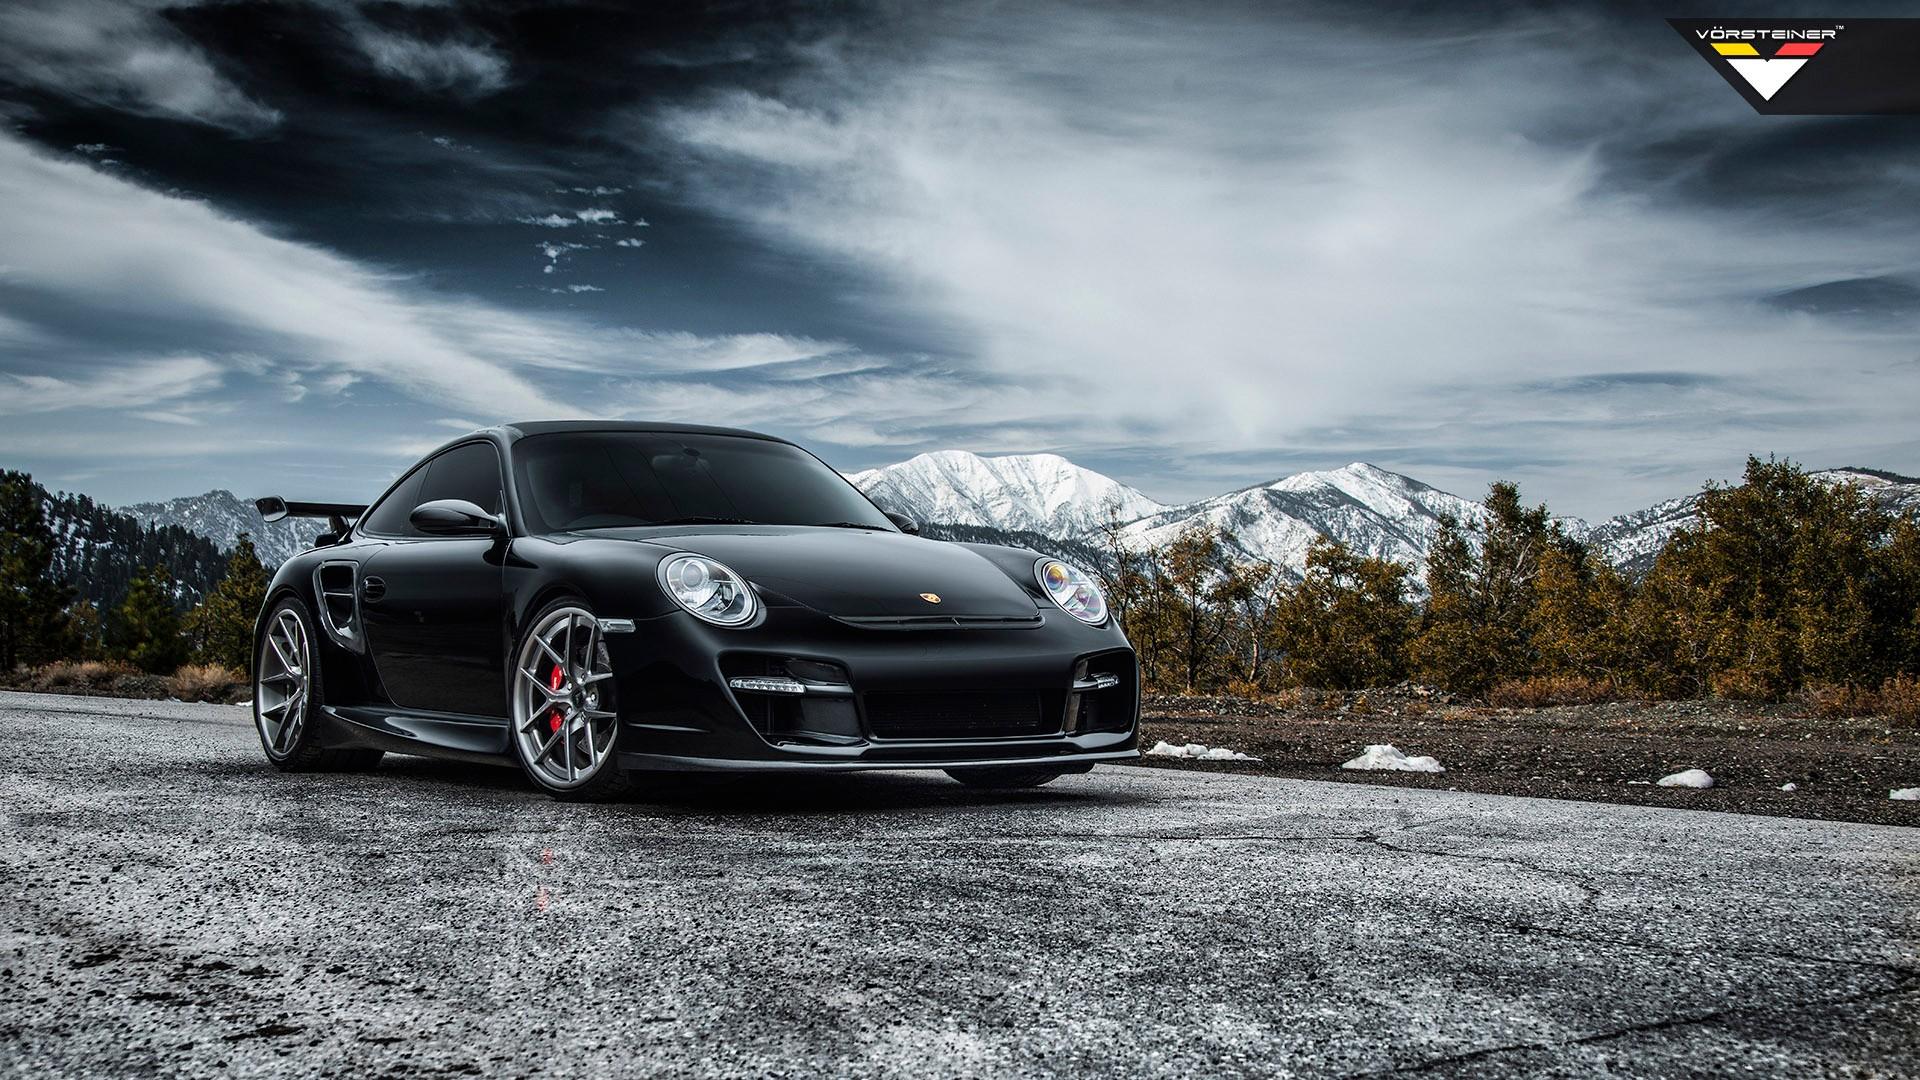 New Girl Wallpaper Download Vorsteiner Porsche 997 V Rt Edition 911 Turbo Wallpaper